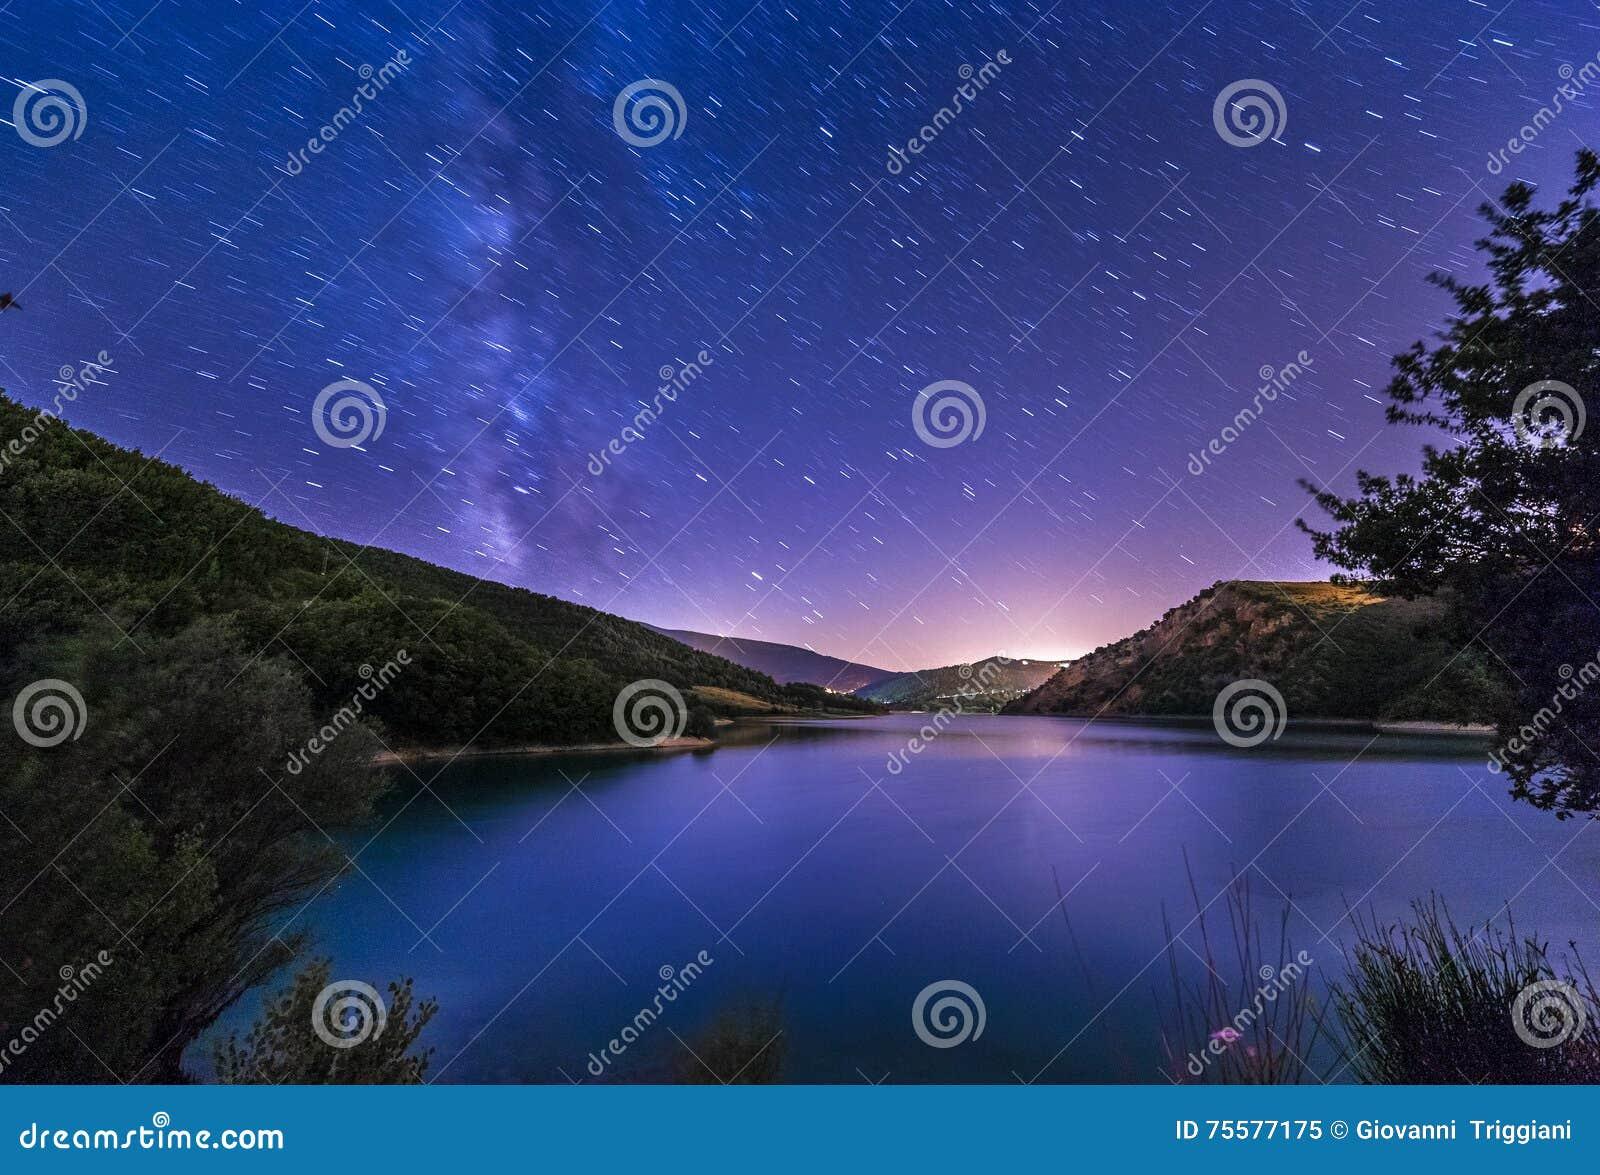 Purple night sky stars lake landscape with milky way on mountain